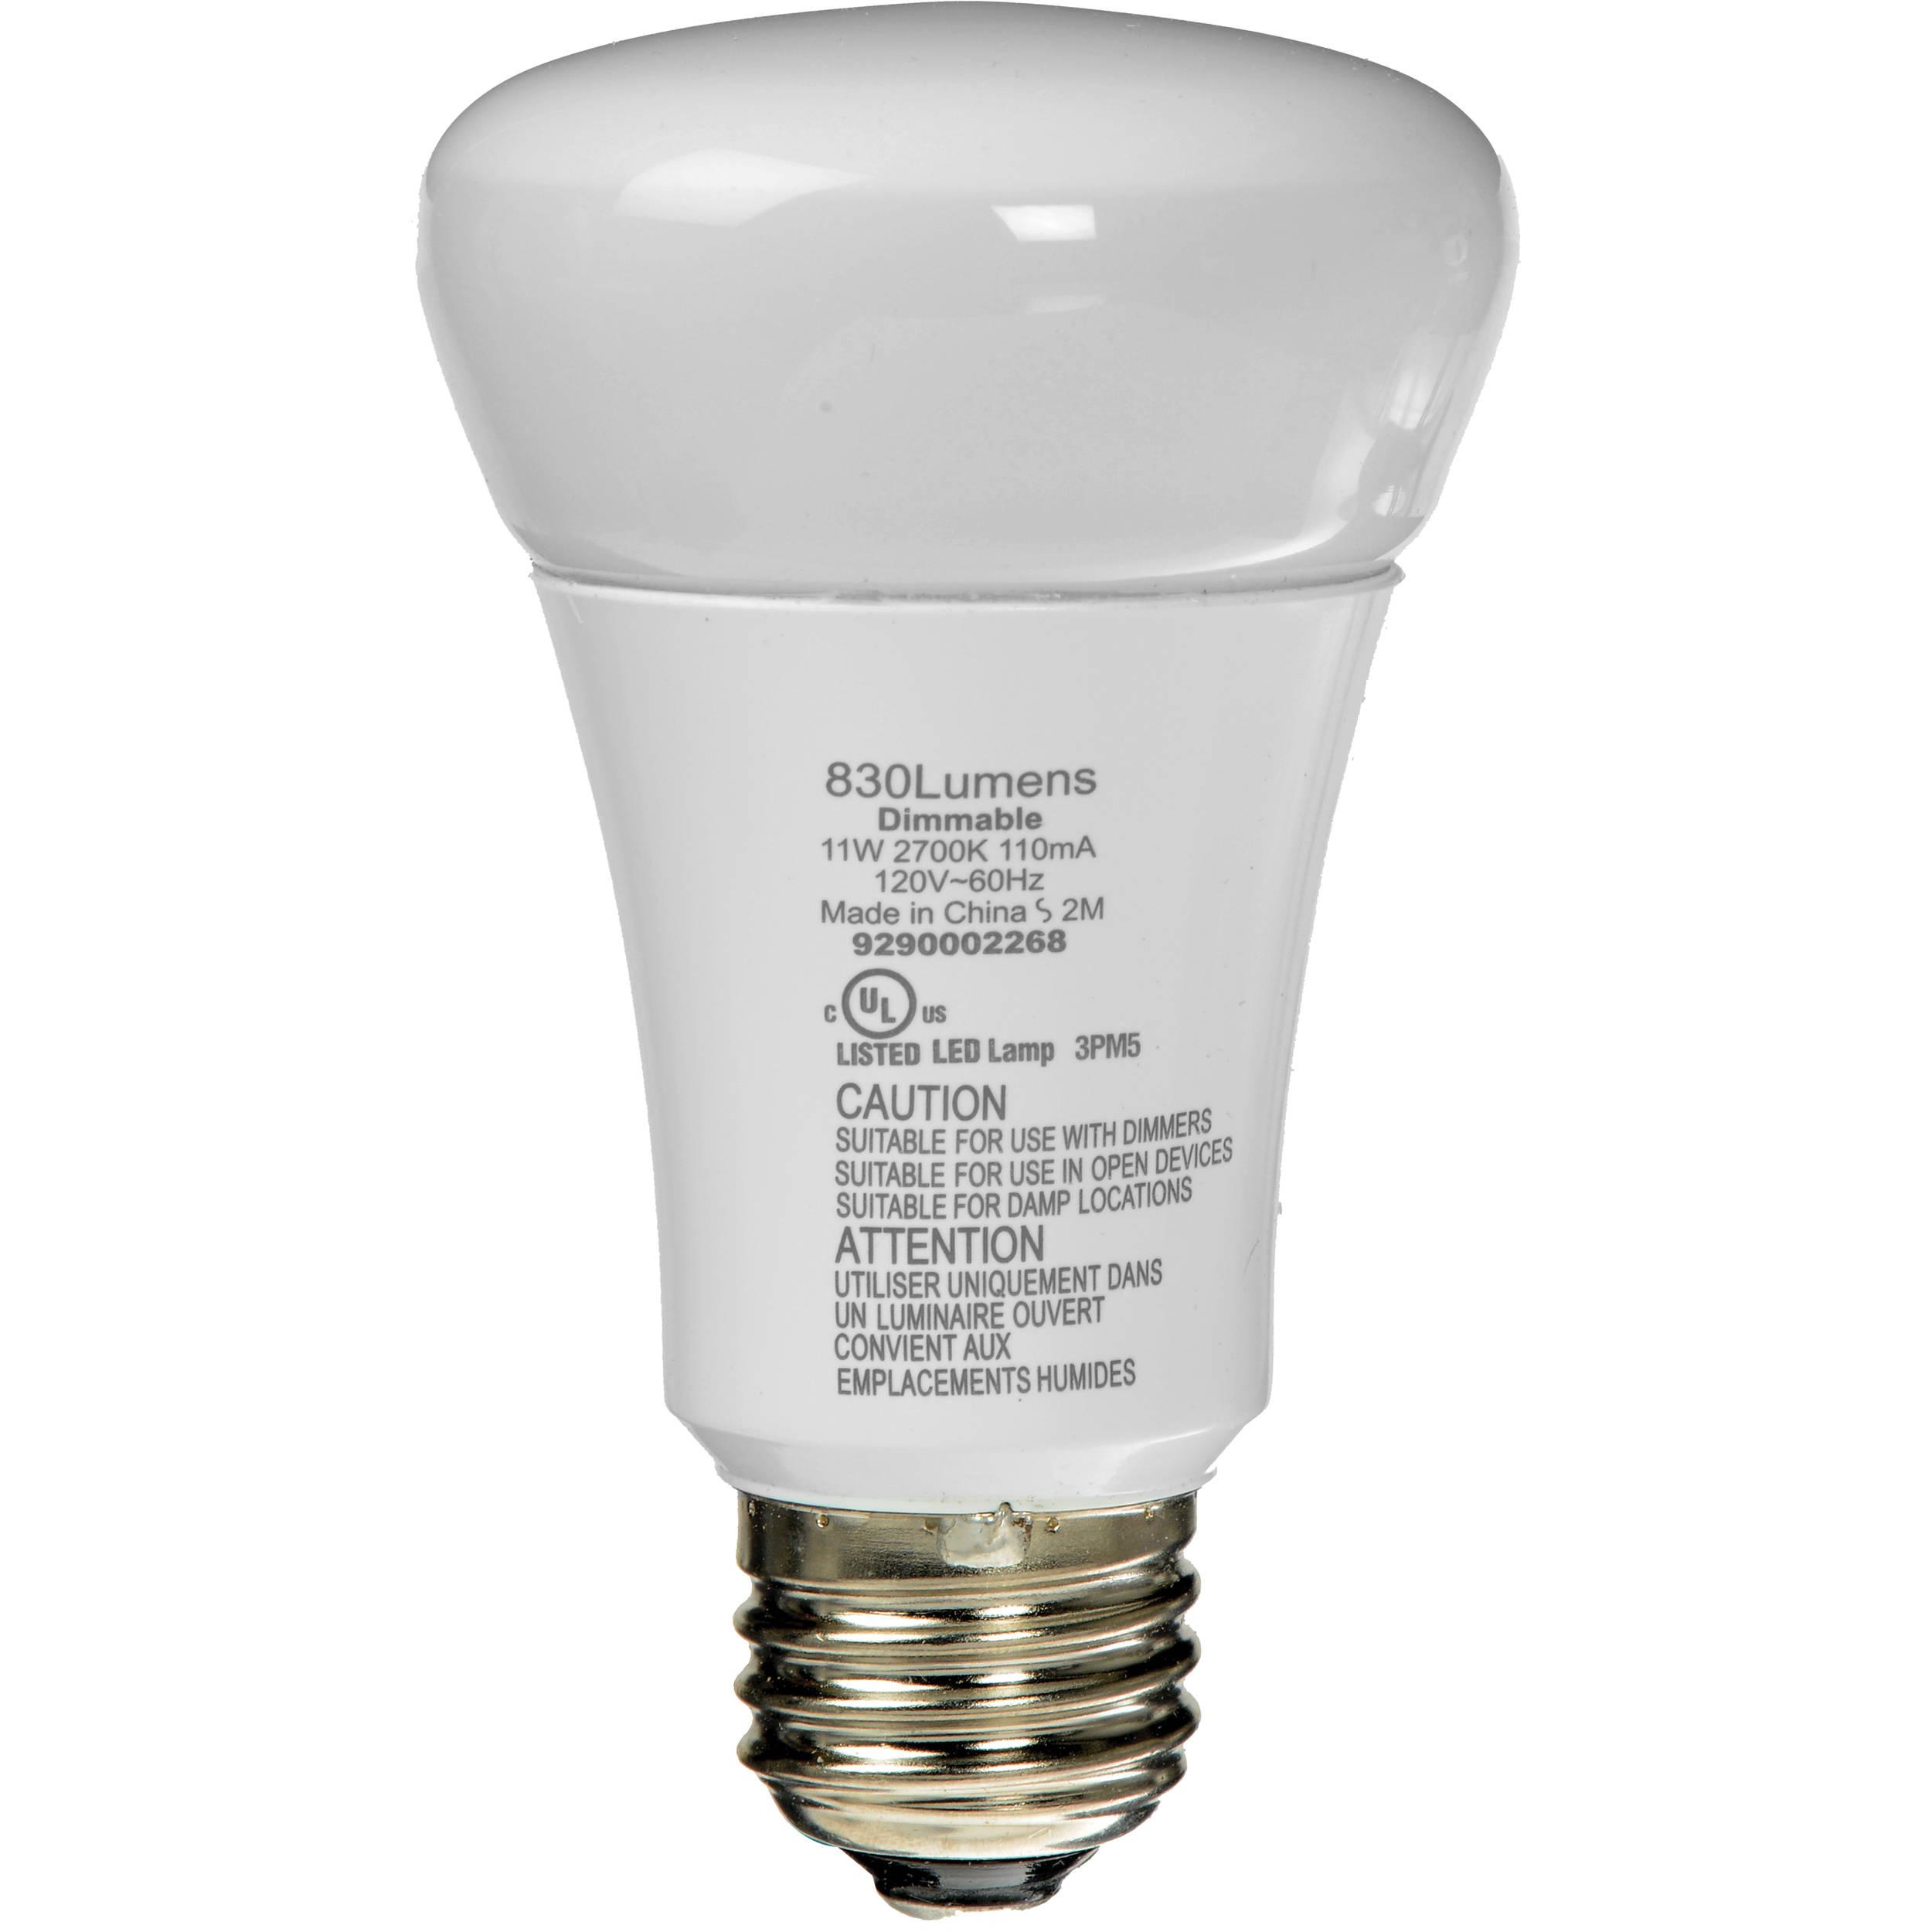 philips lighting led products pack titanium wall light keene